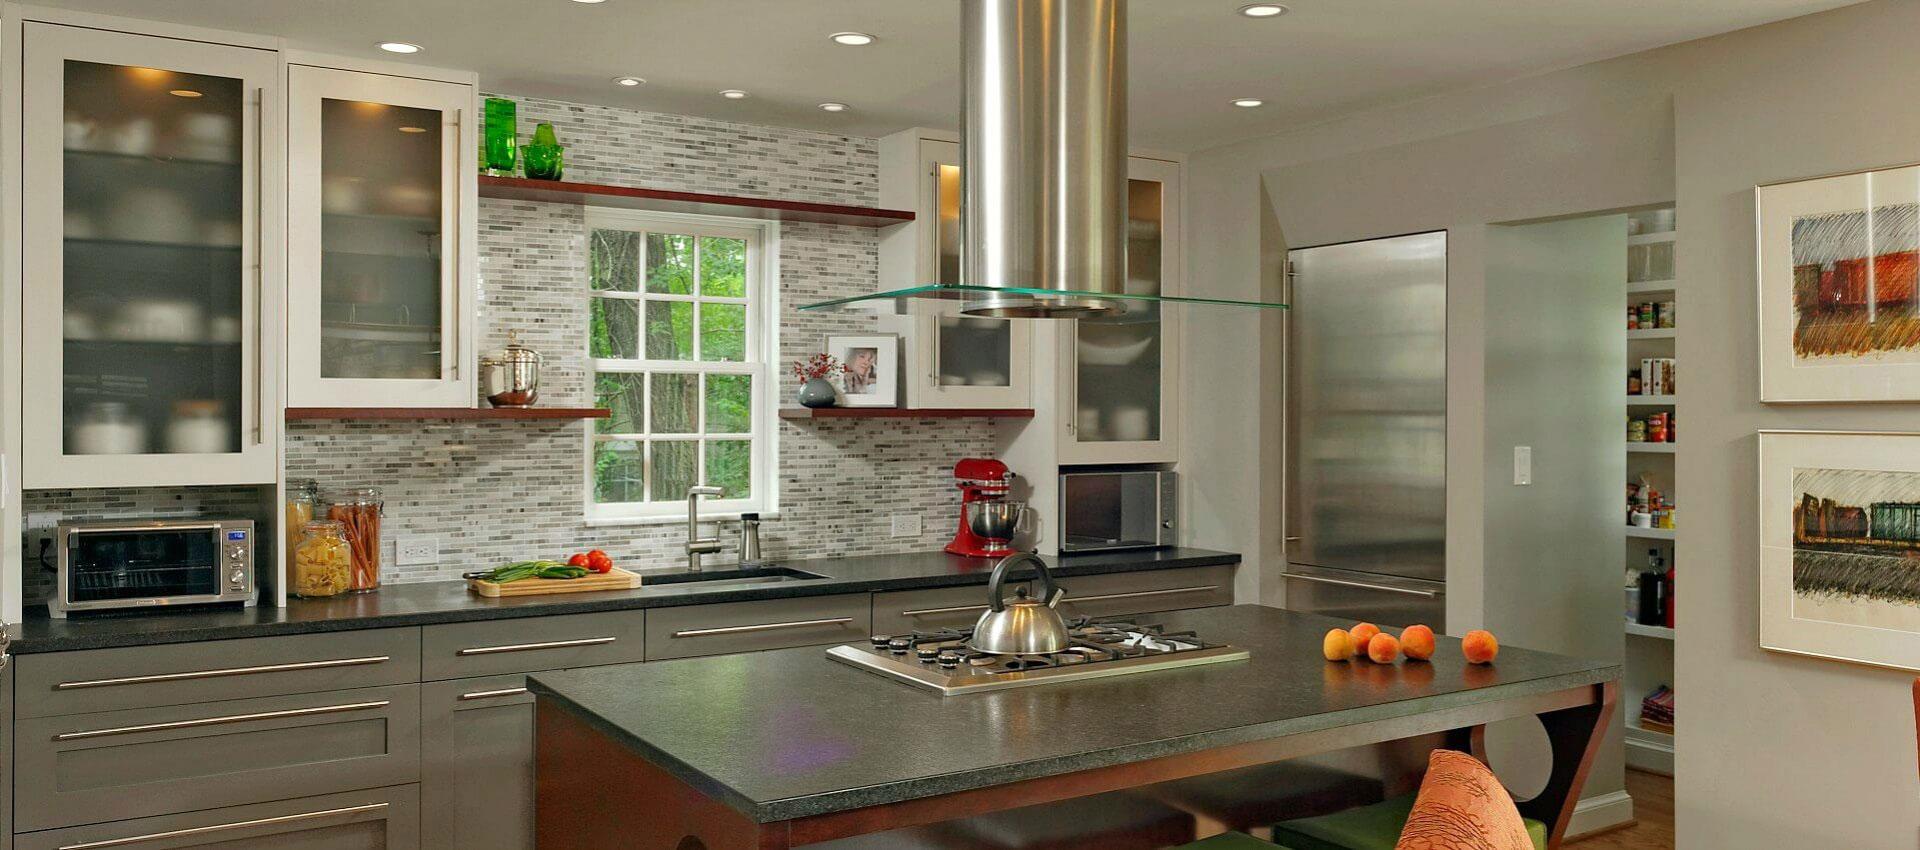 Custom Kitchens And Baths La Plata Md